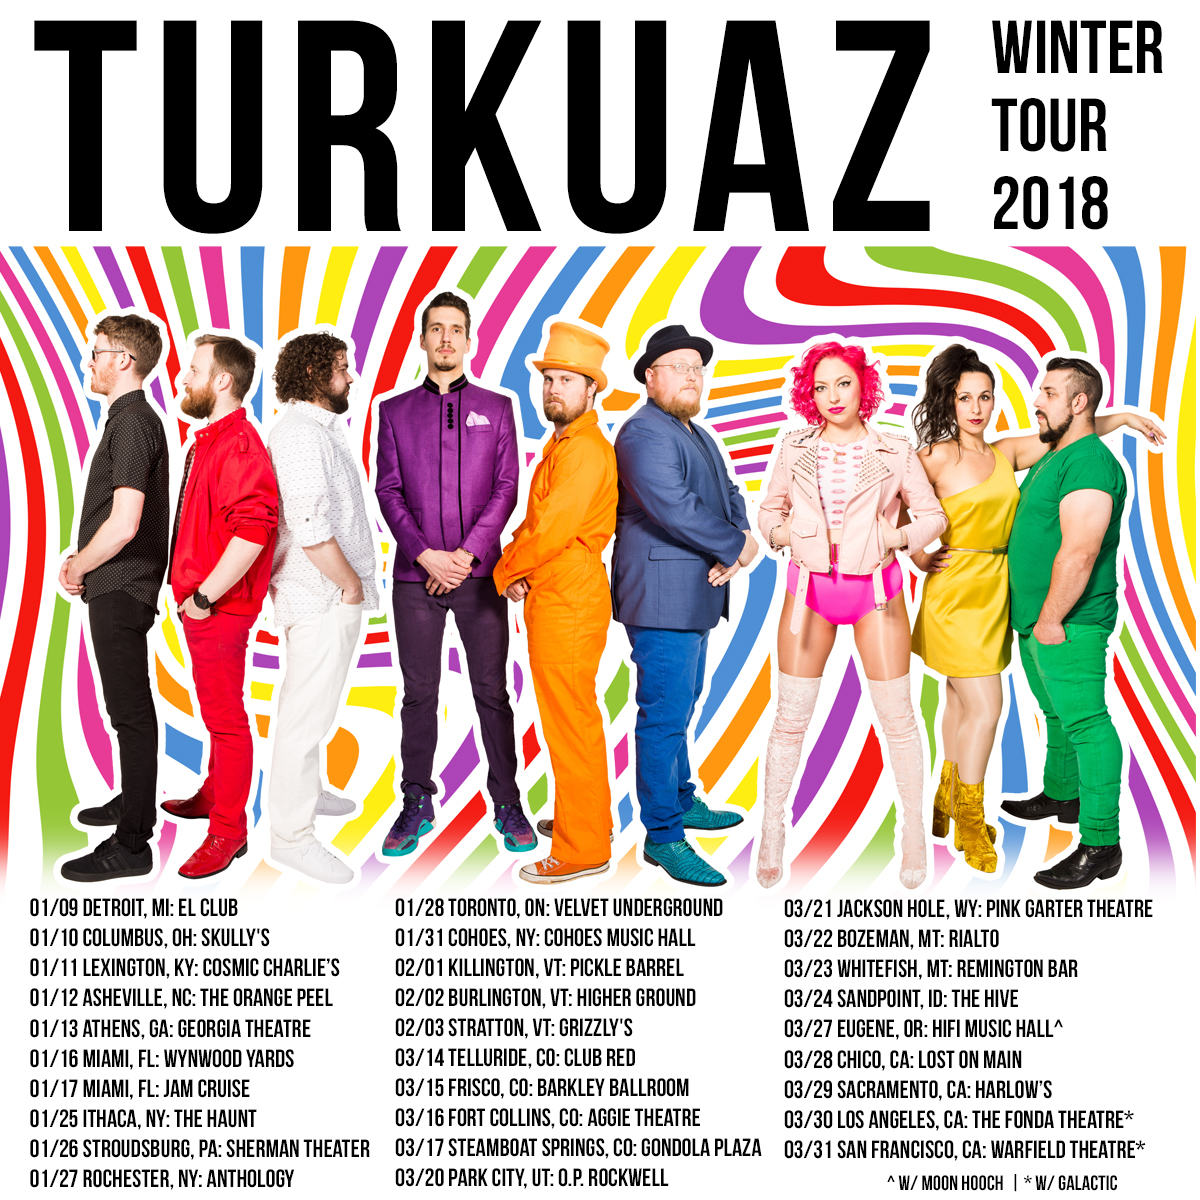 Turkuaz_Winter2018_Insta_AllDates.jpg